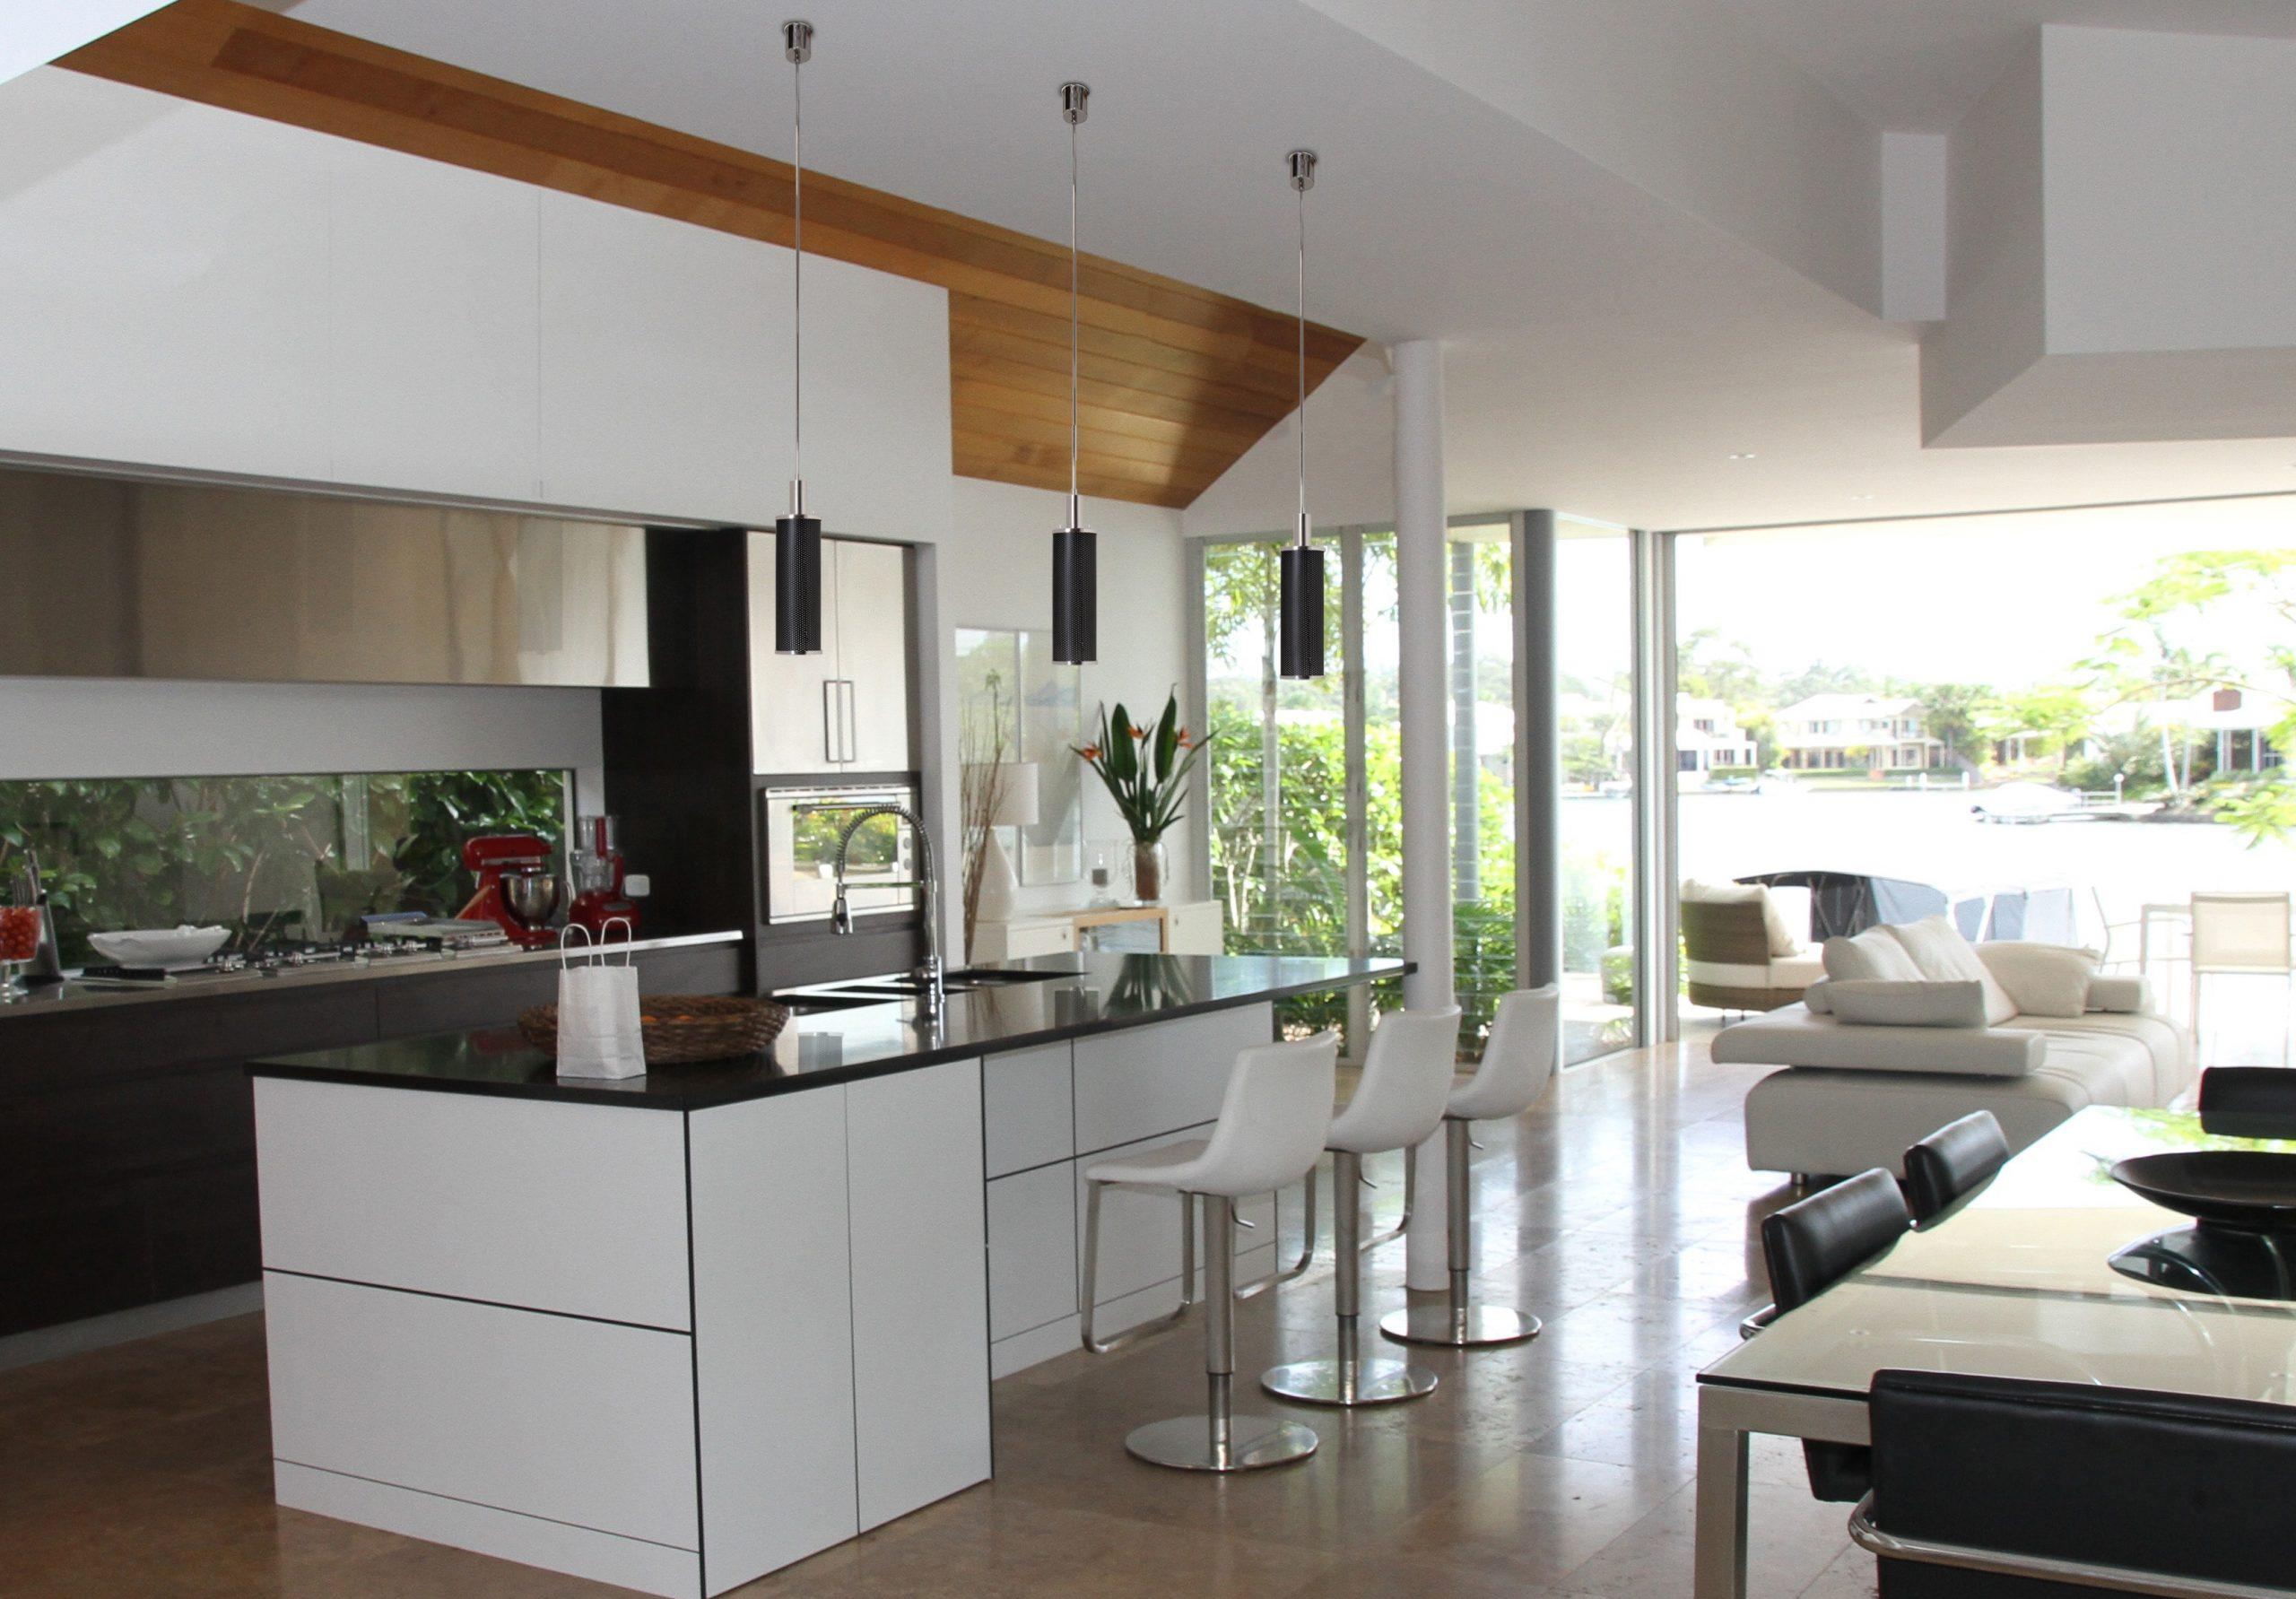 5 Amazing Kitchen Island Ideas 🍳 CHECK OUT! kitchen island 5 Amazing Kitchen Island Ideas 🍳 CHECK OUT! 4 15 scaled